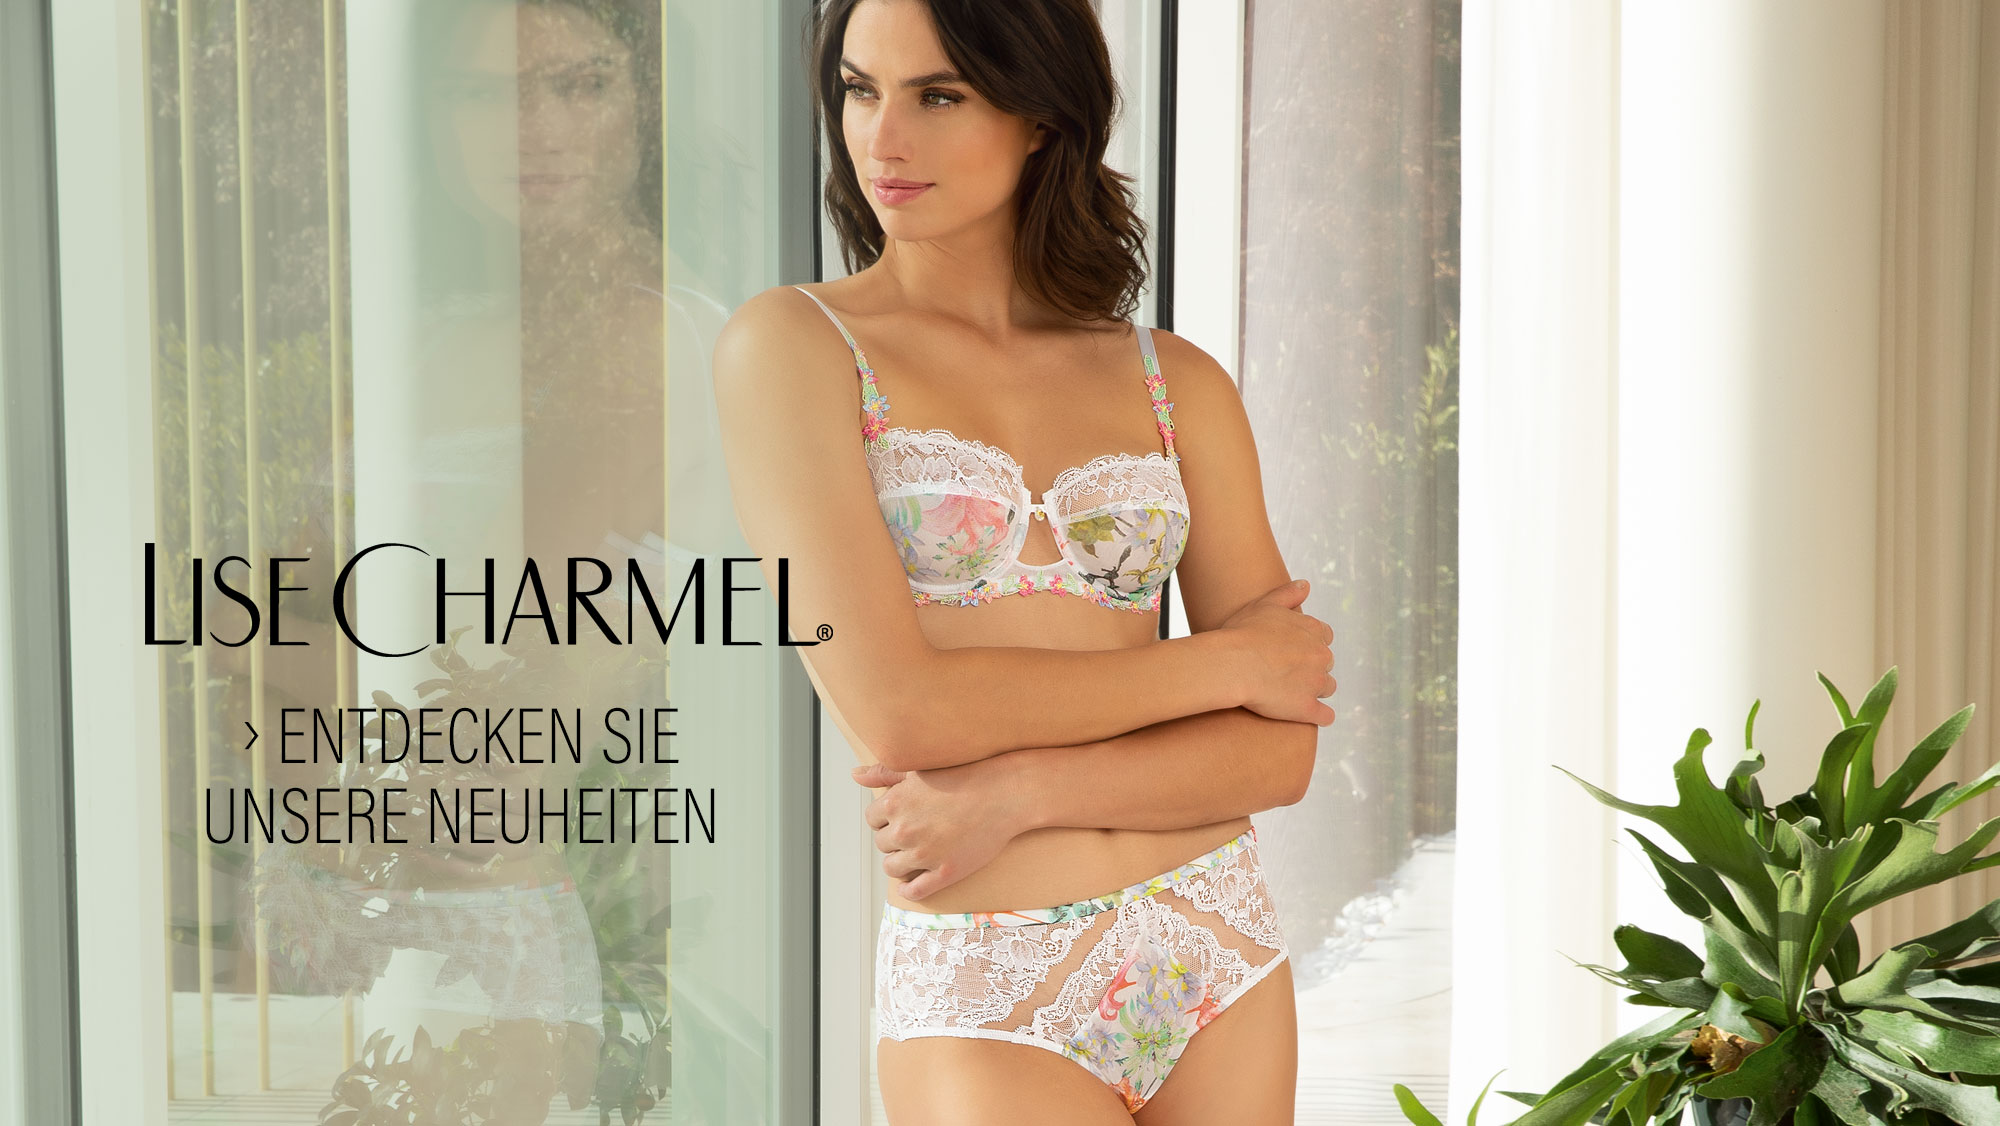 Lise Charmel Neuheiten